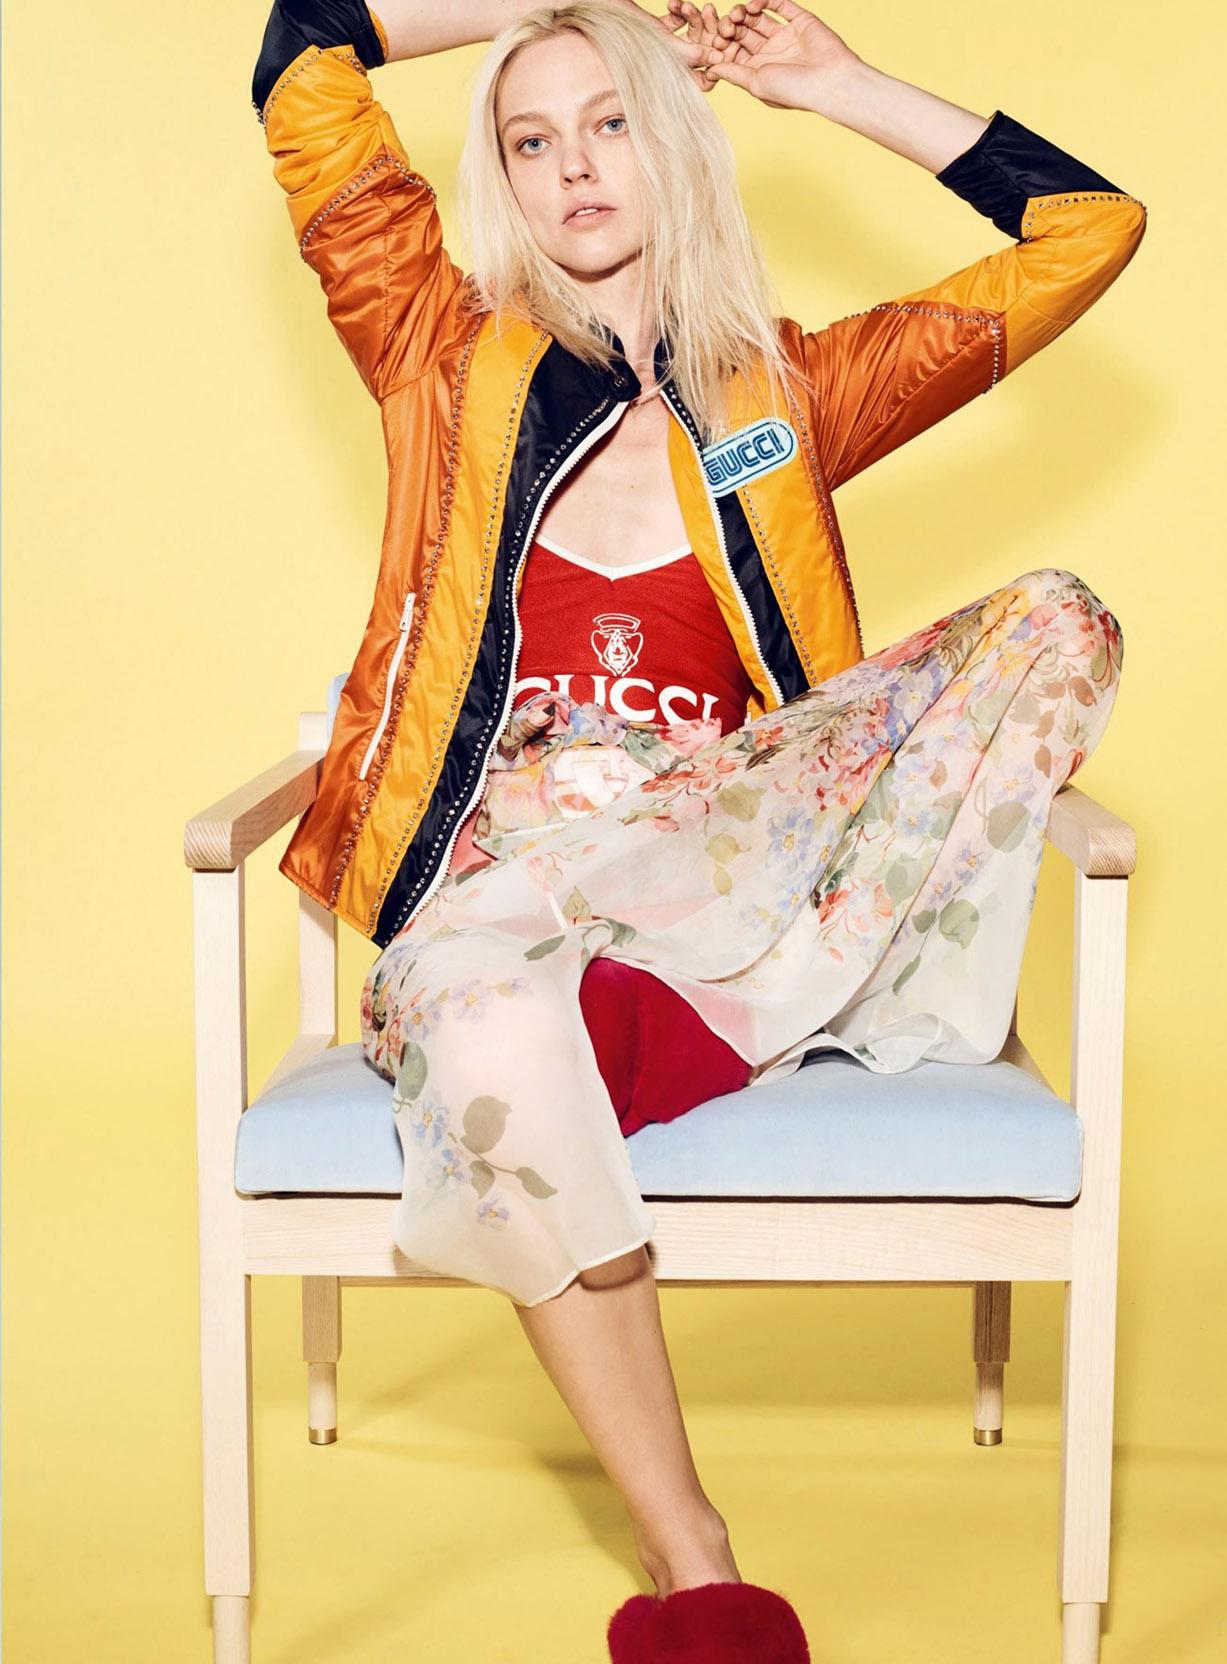 Sasha Pivovarova by Liz Collins - Vogue Turkey april 2018 / Gunduz Dusleri